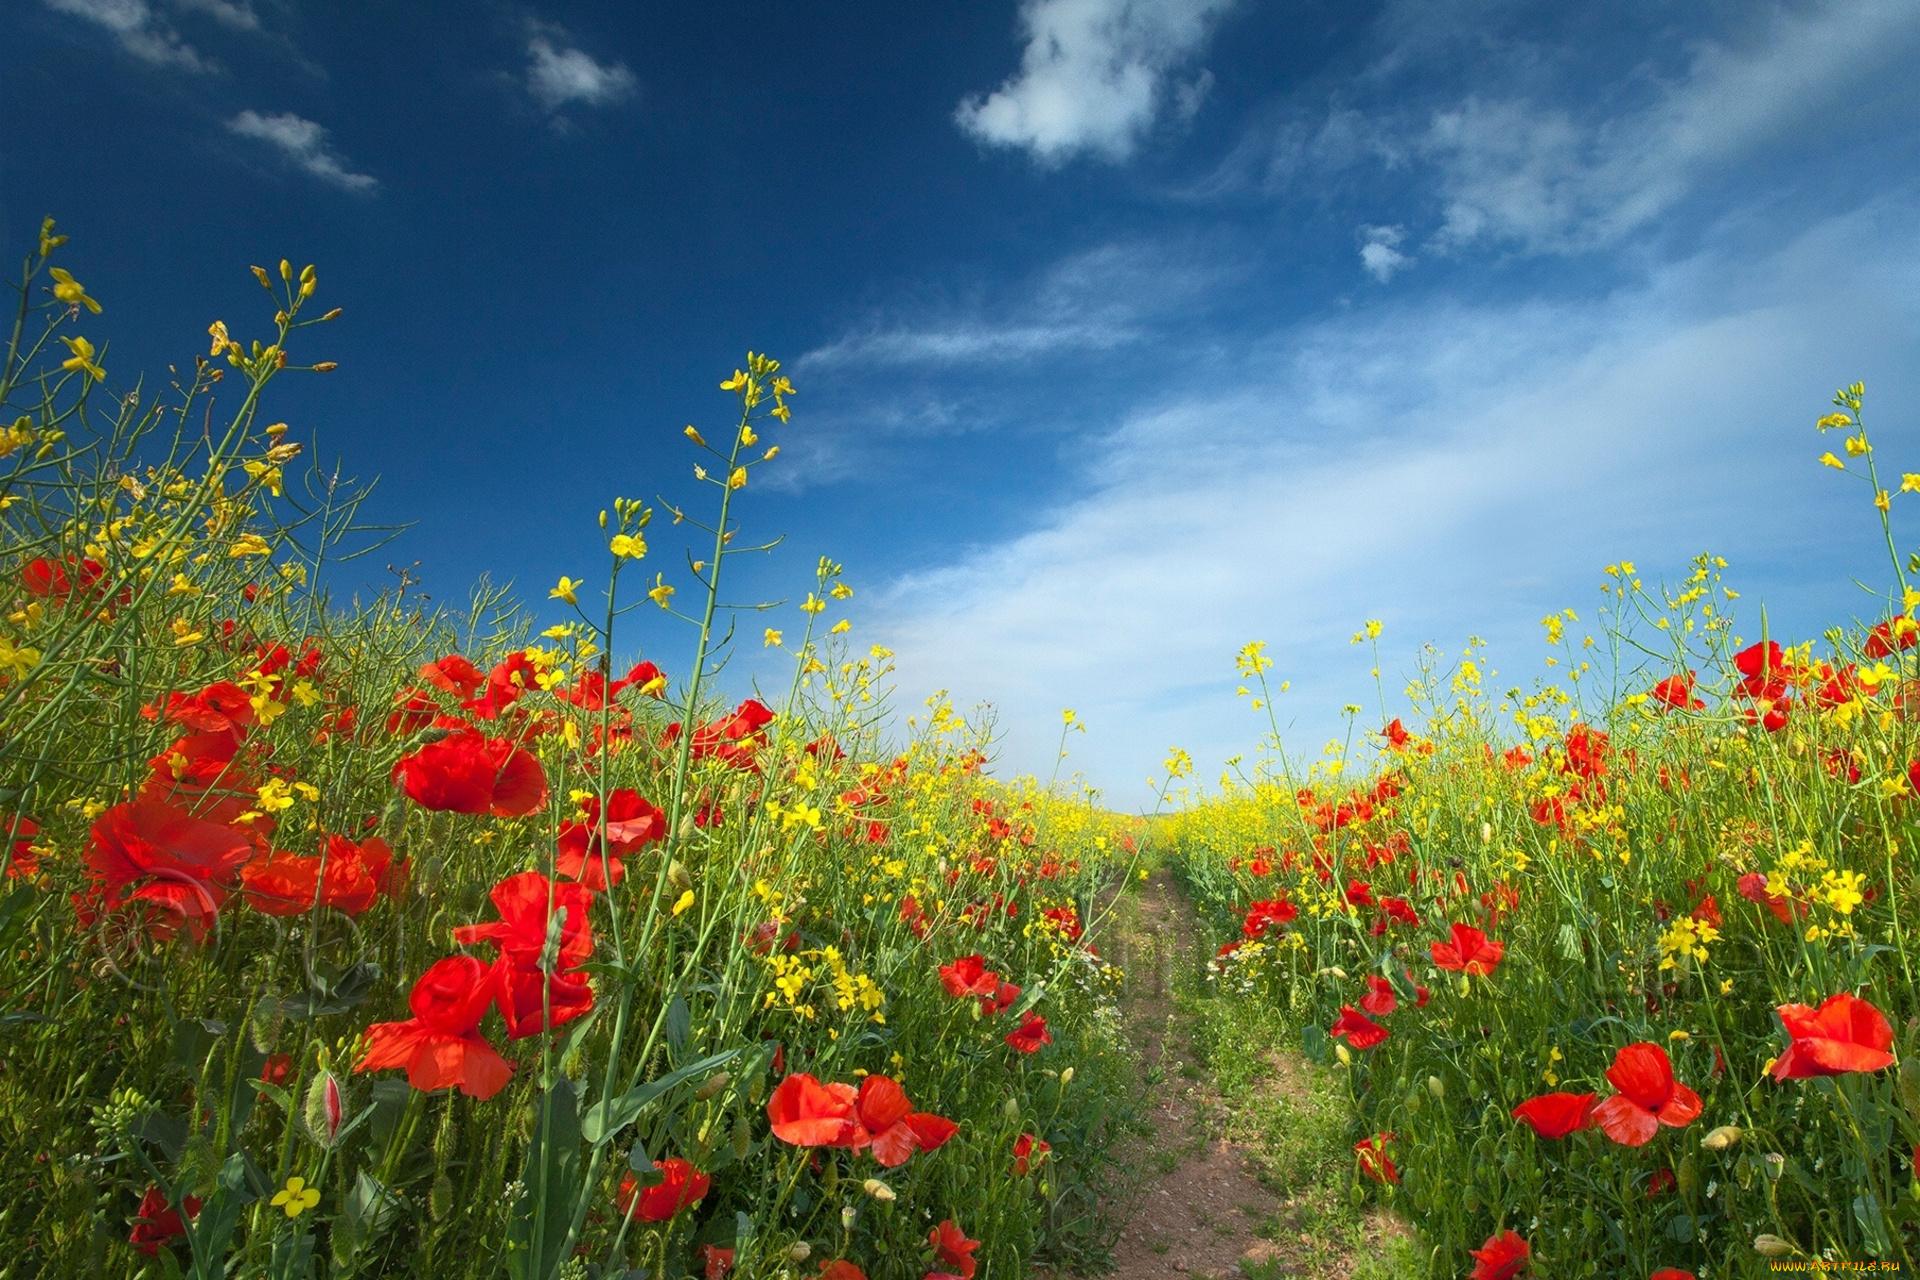 закат небо поляна цветы  № 3229901  скачать